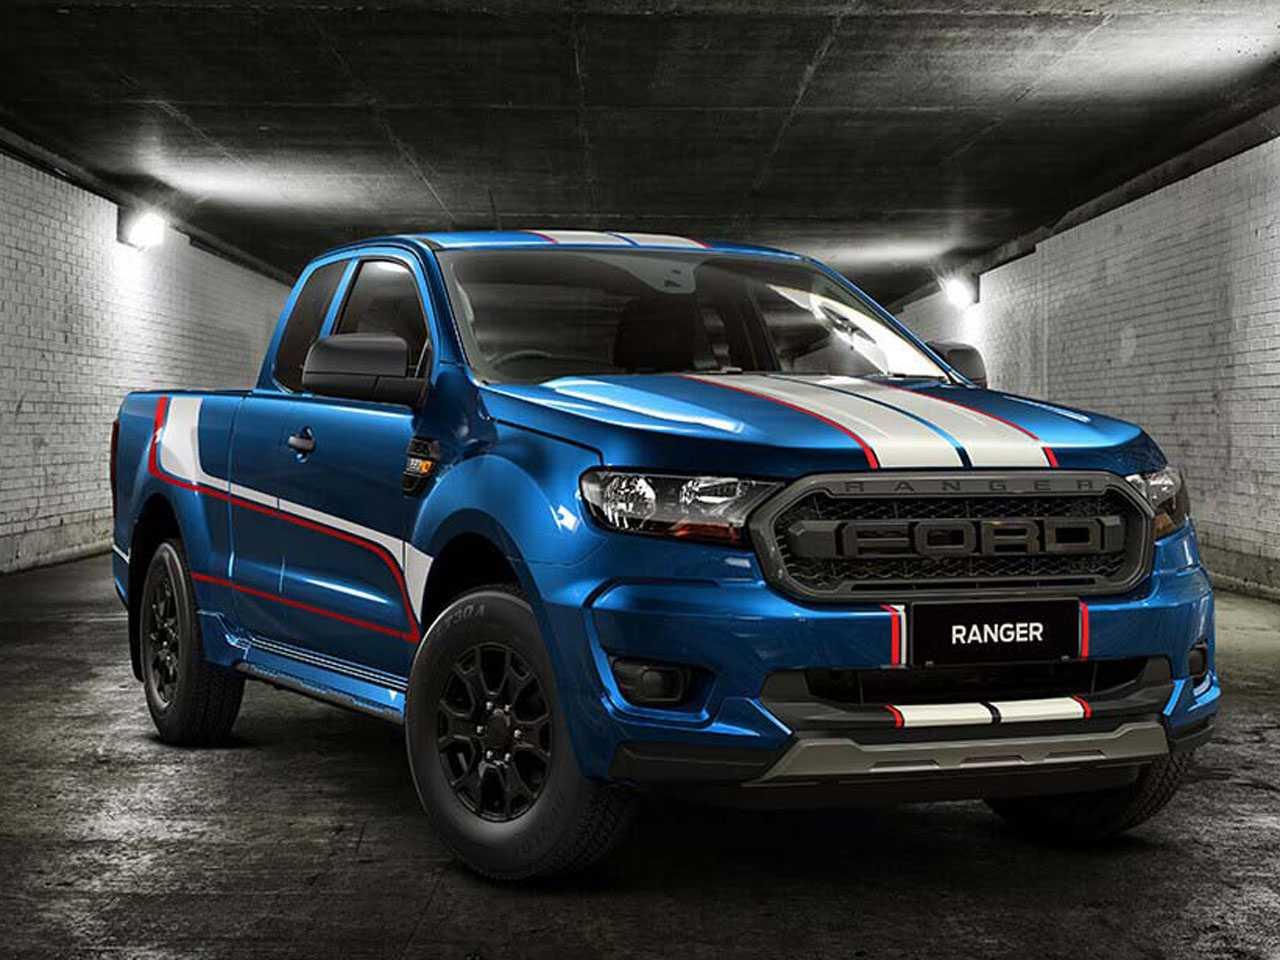 Ford Ranger XL Street Special Edition lançada na Tailândia